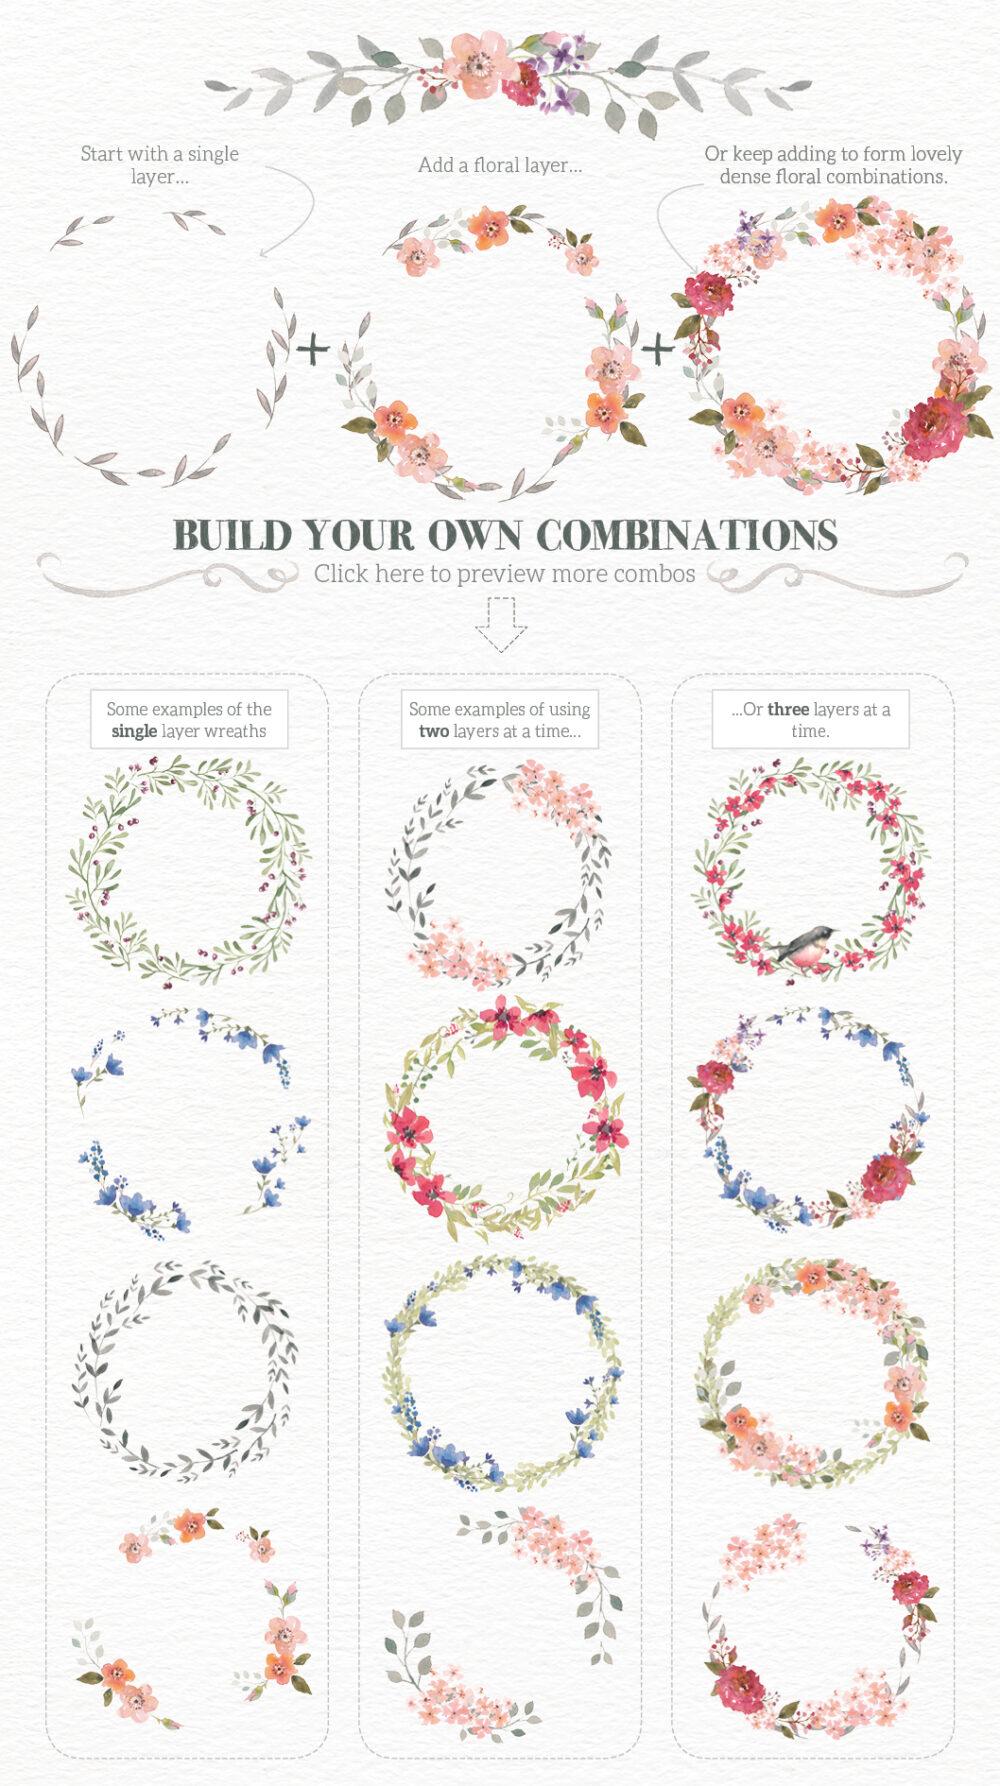 Watercolour-wreath-creator_Lisa-Glanz-02